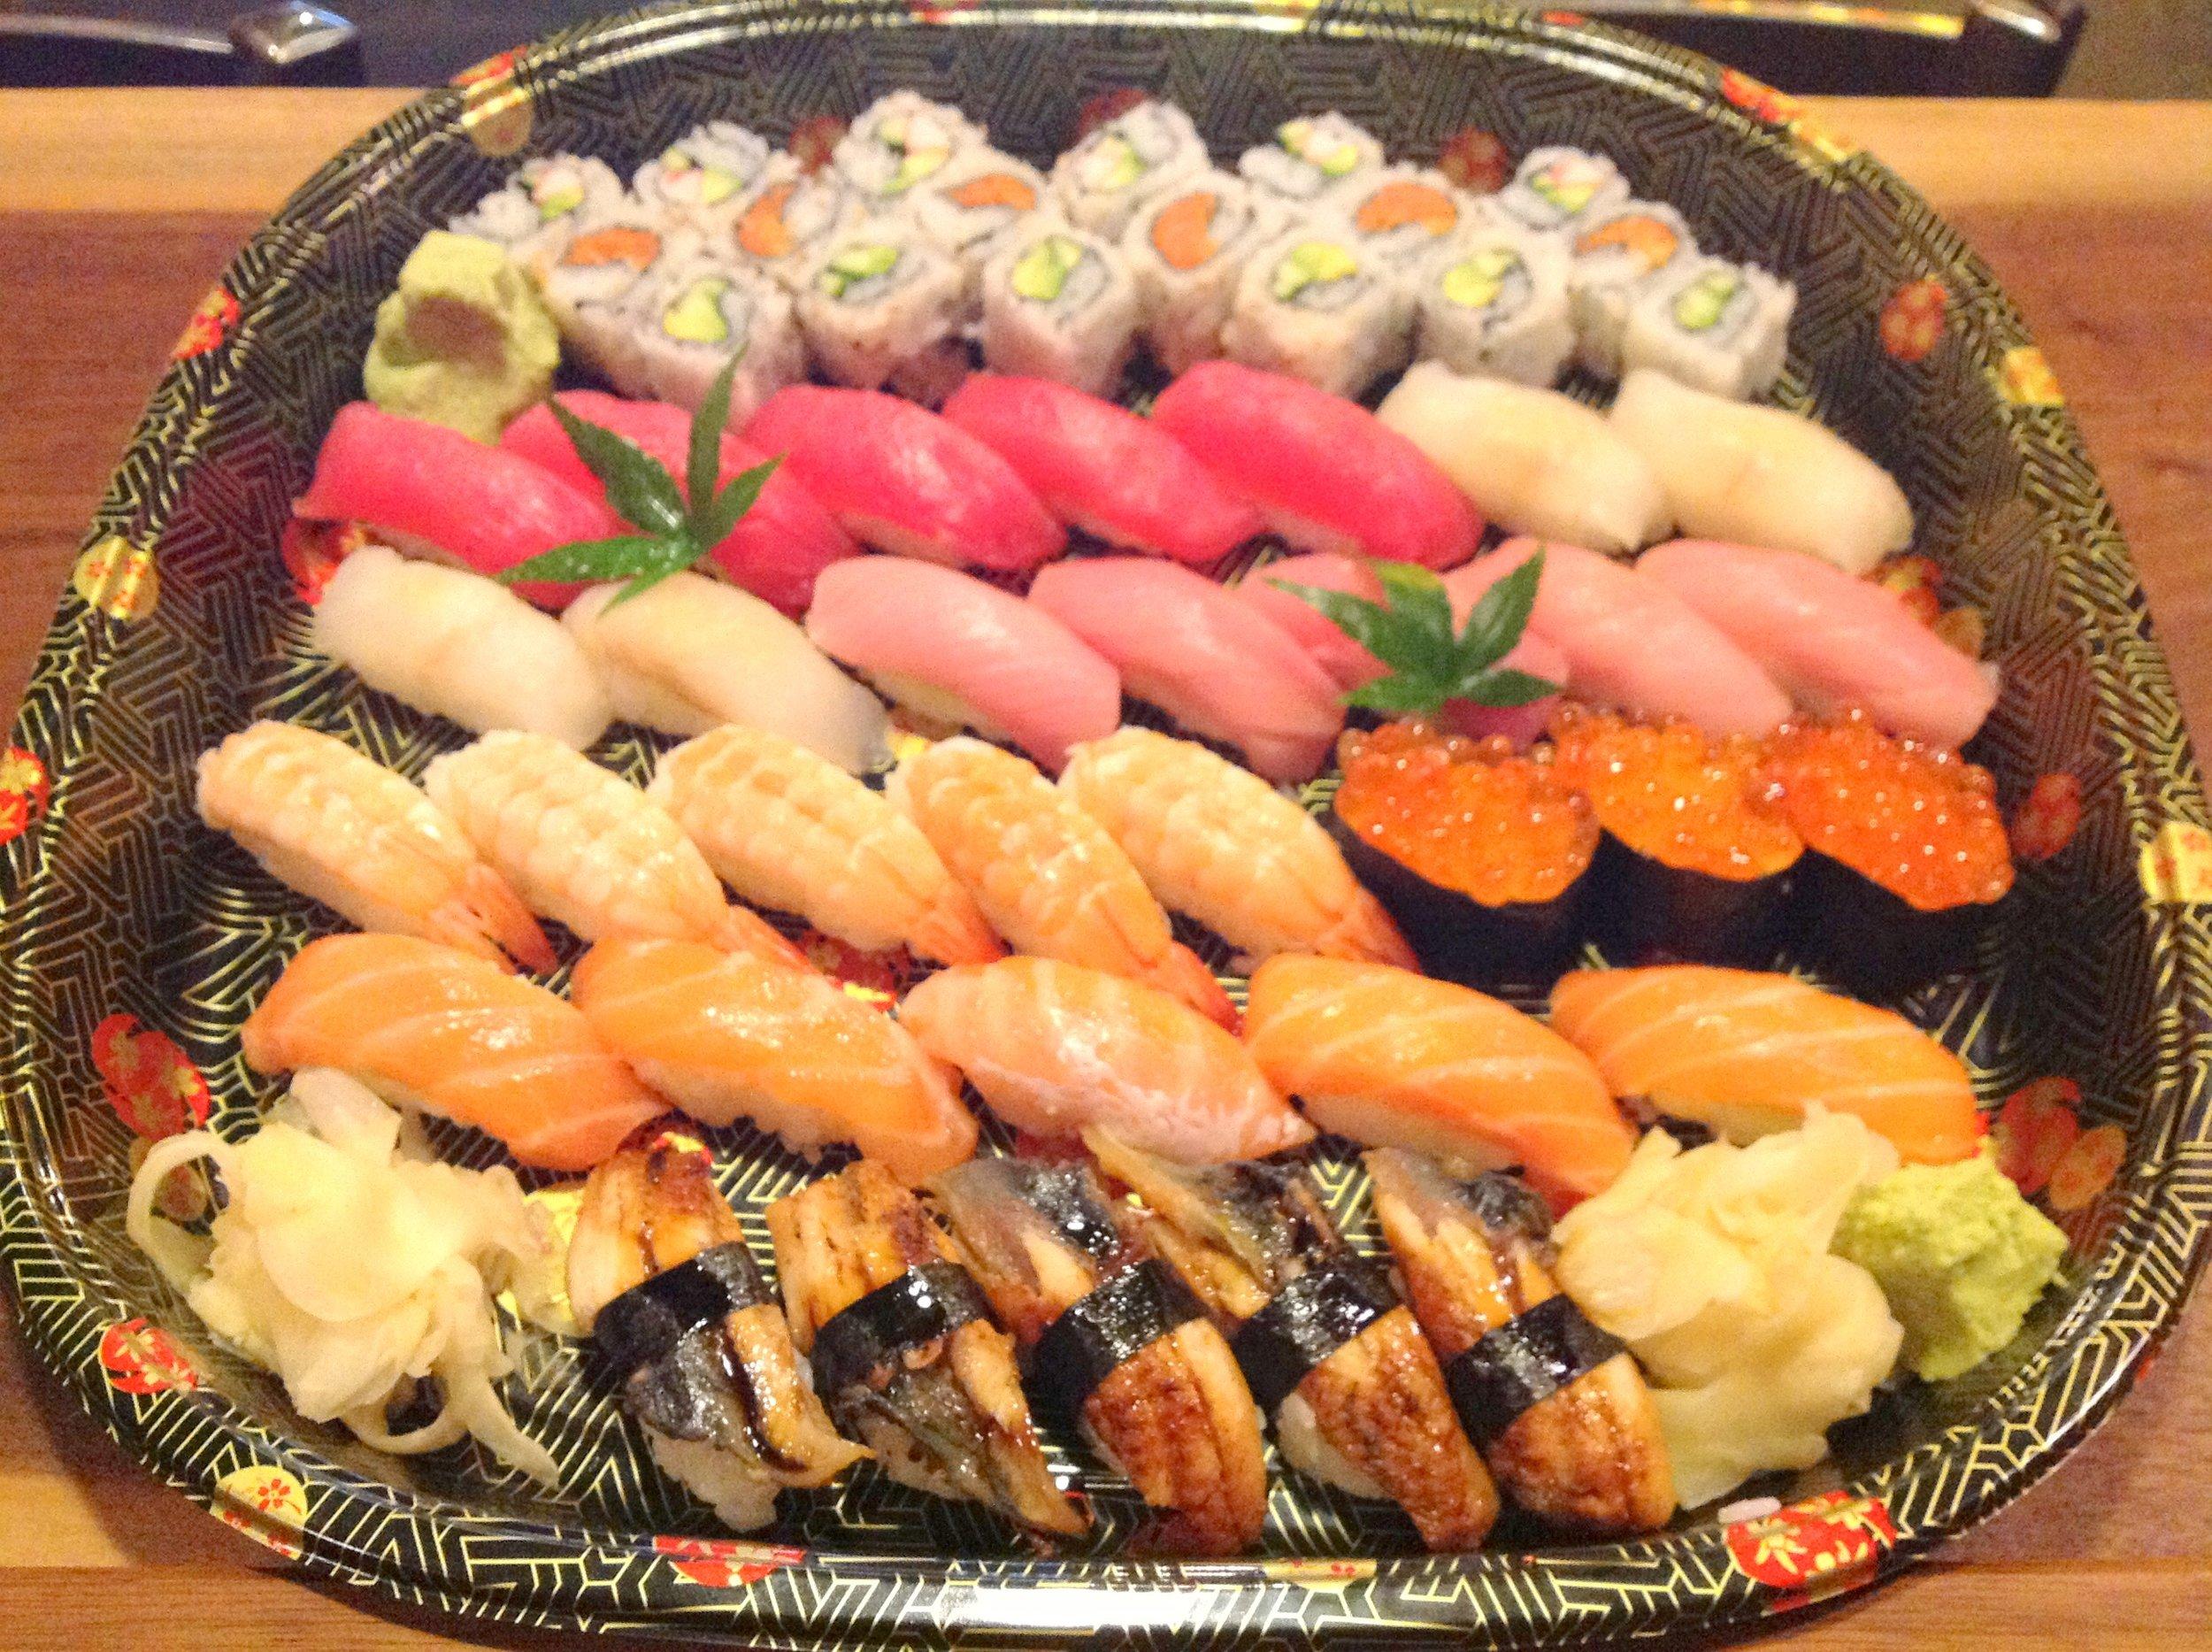 New Year Sushi Platter